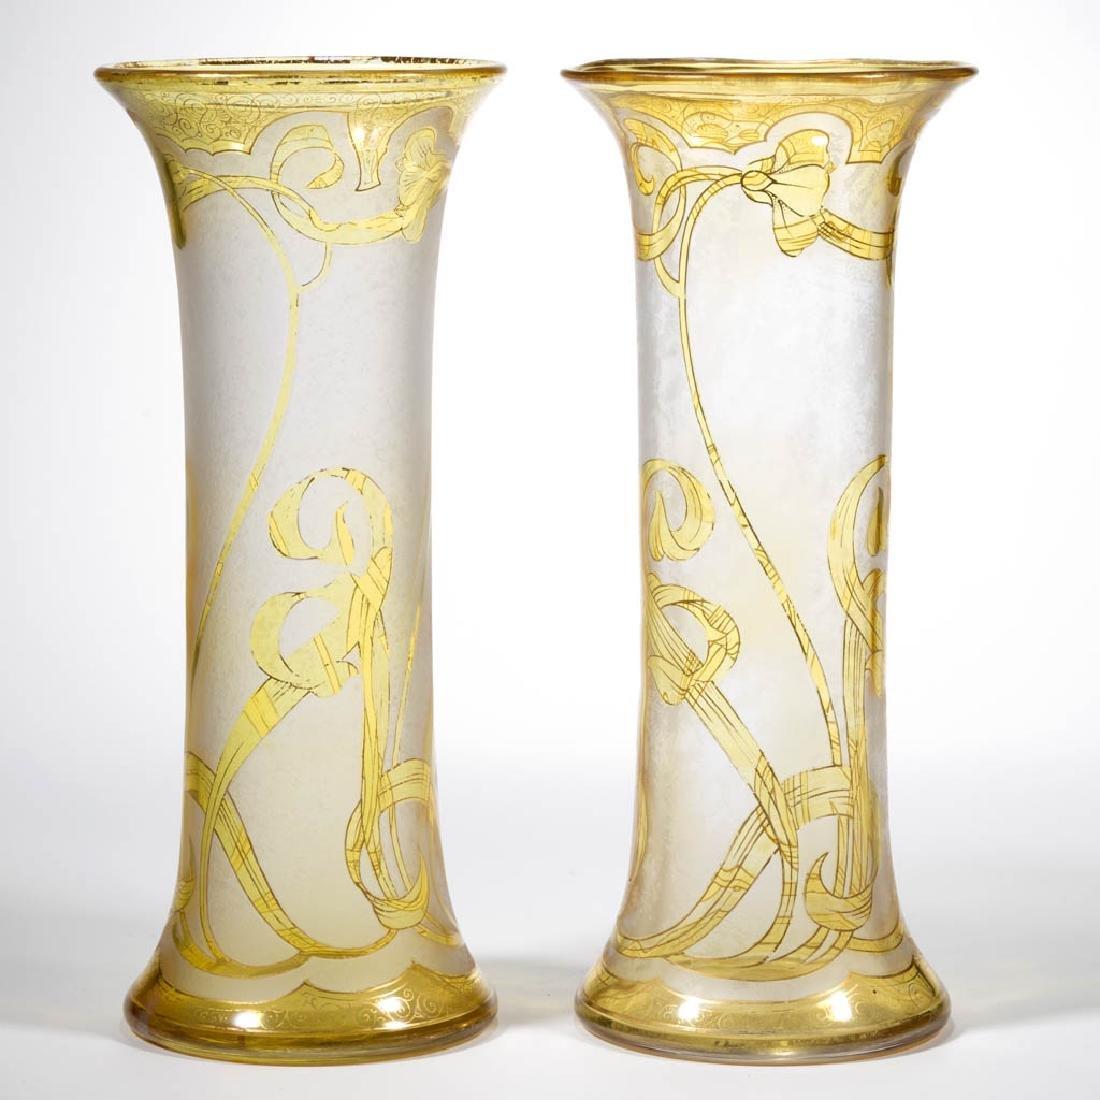 DORFLINGER HONESDALE FLORAL CAMEO ART GLASS PAIR OF - 2